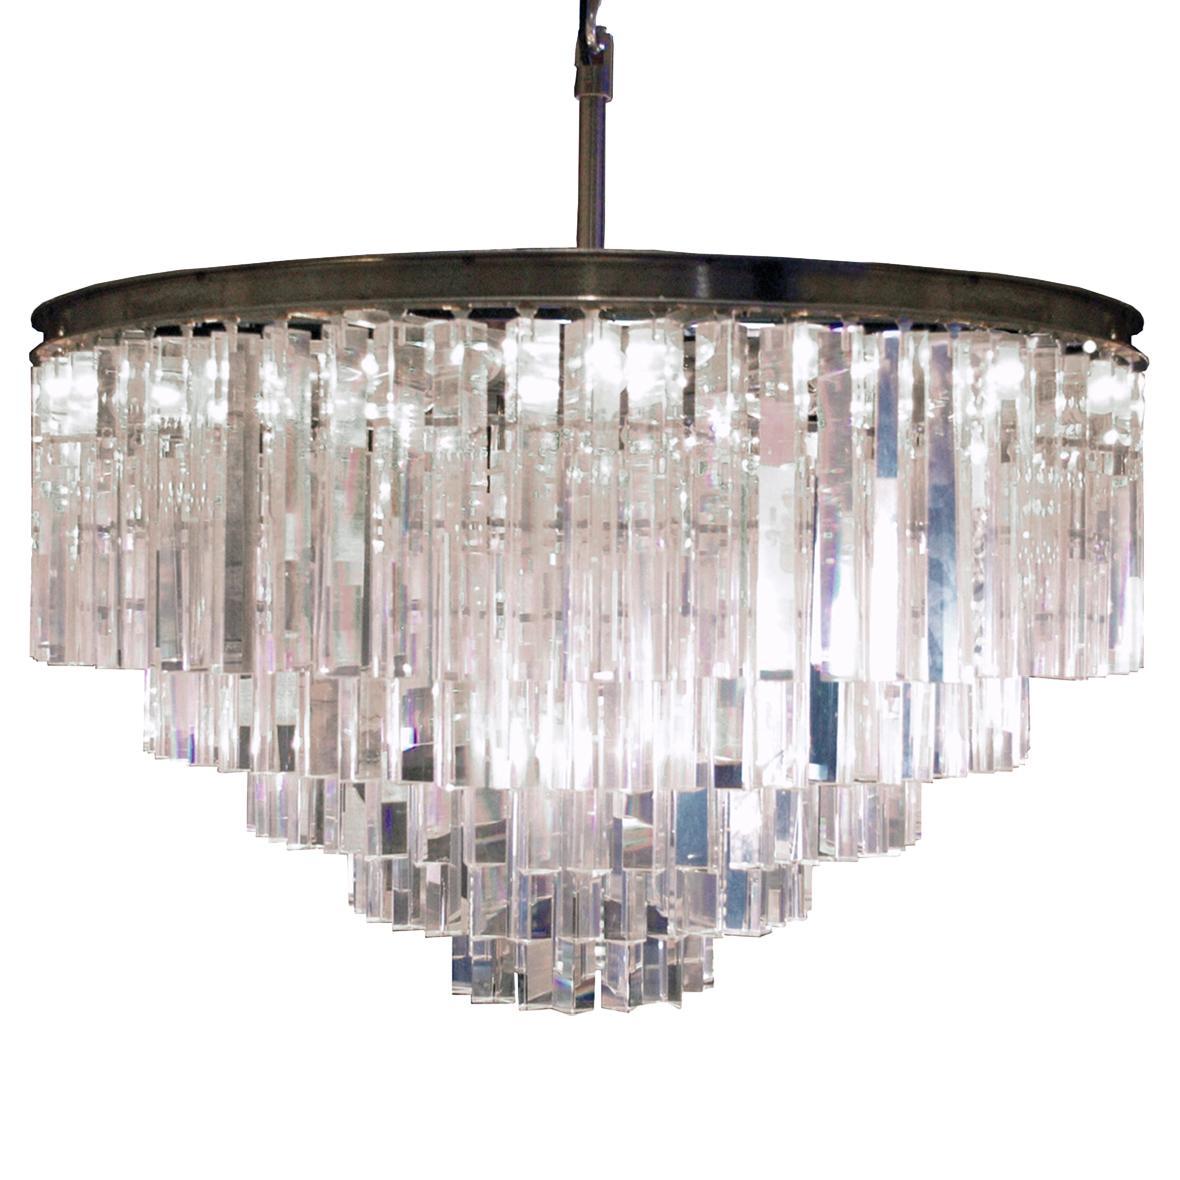 Desmond Hollywood Regency Optical Glass Crystal 5 Tier Chandelier